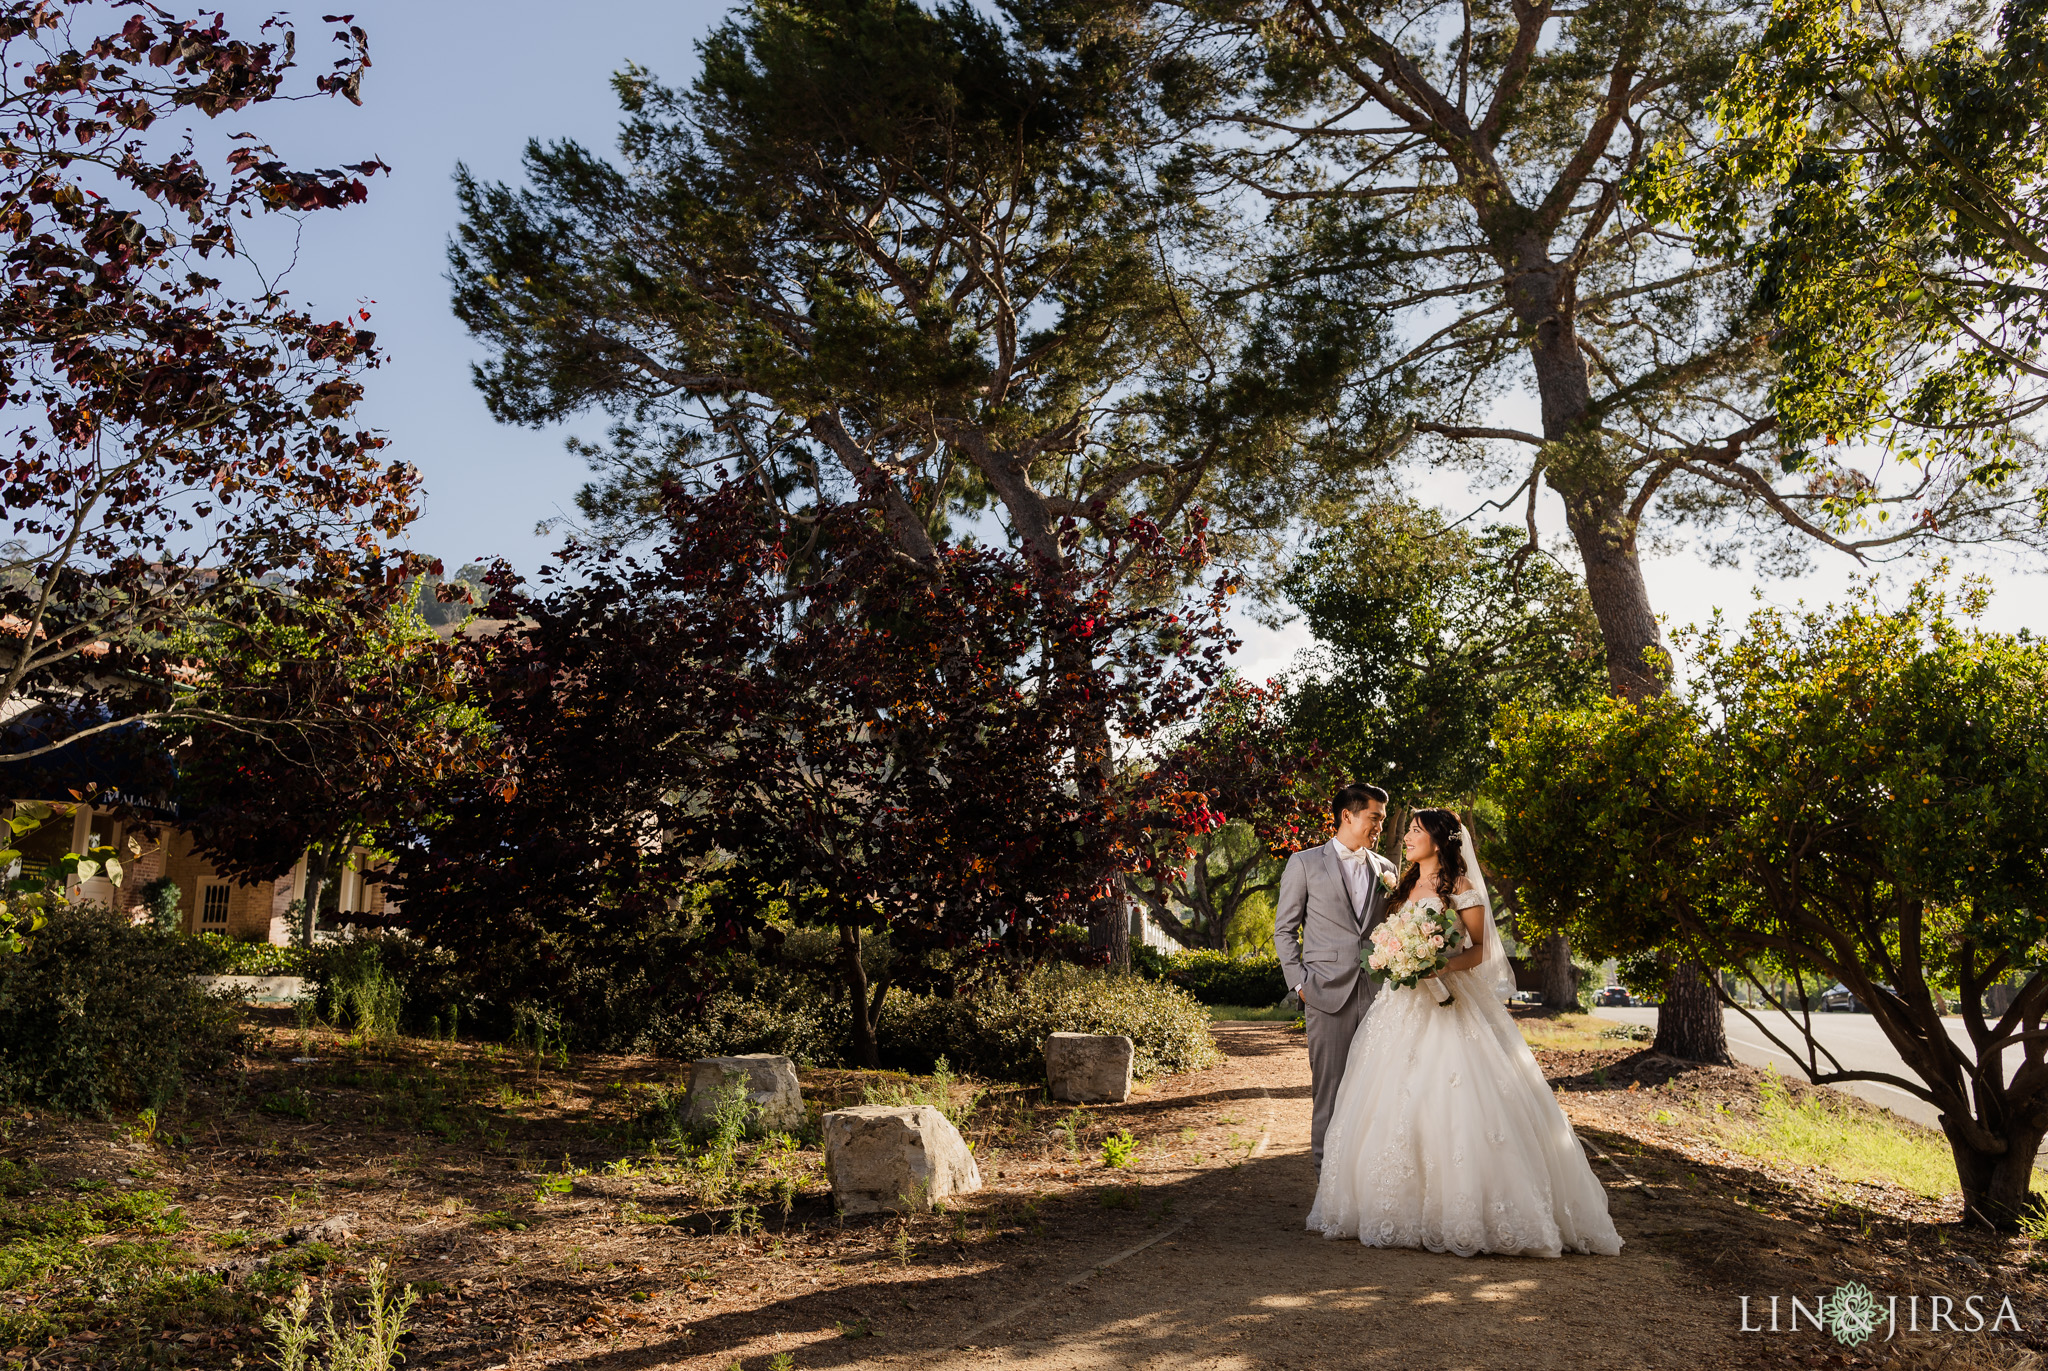 04 Malaga Cove Plaza Rancho Palos Verdes Engagement Photography